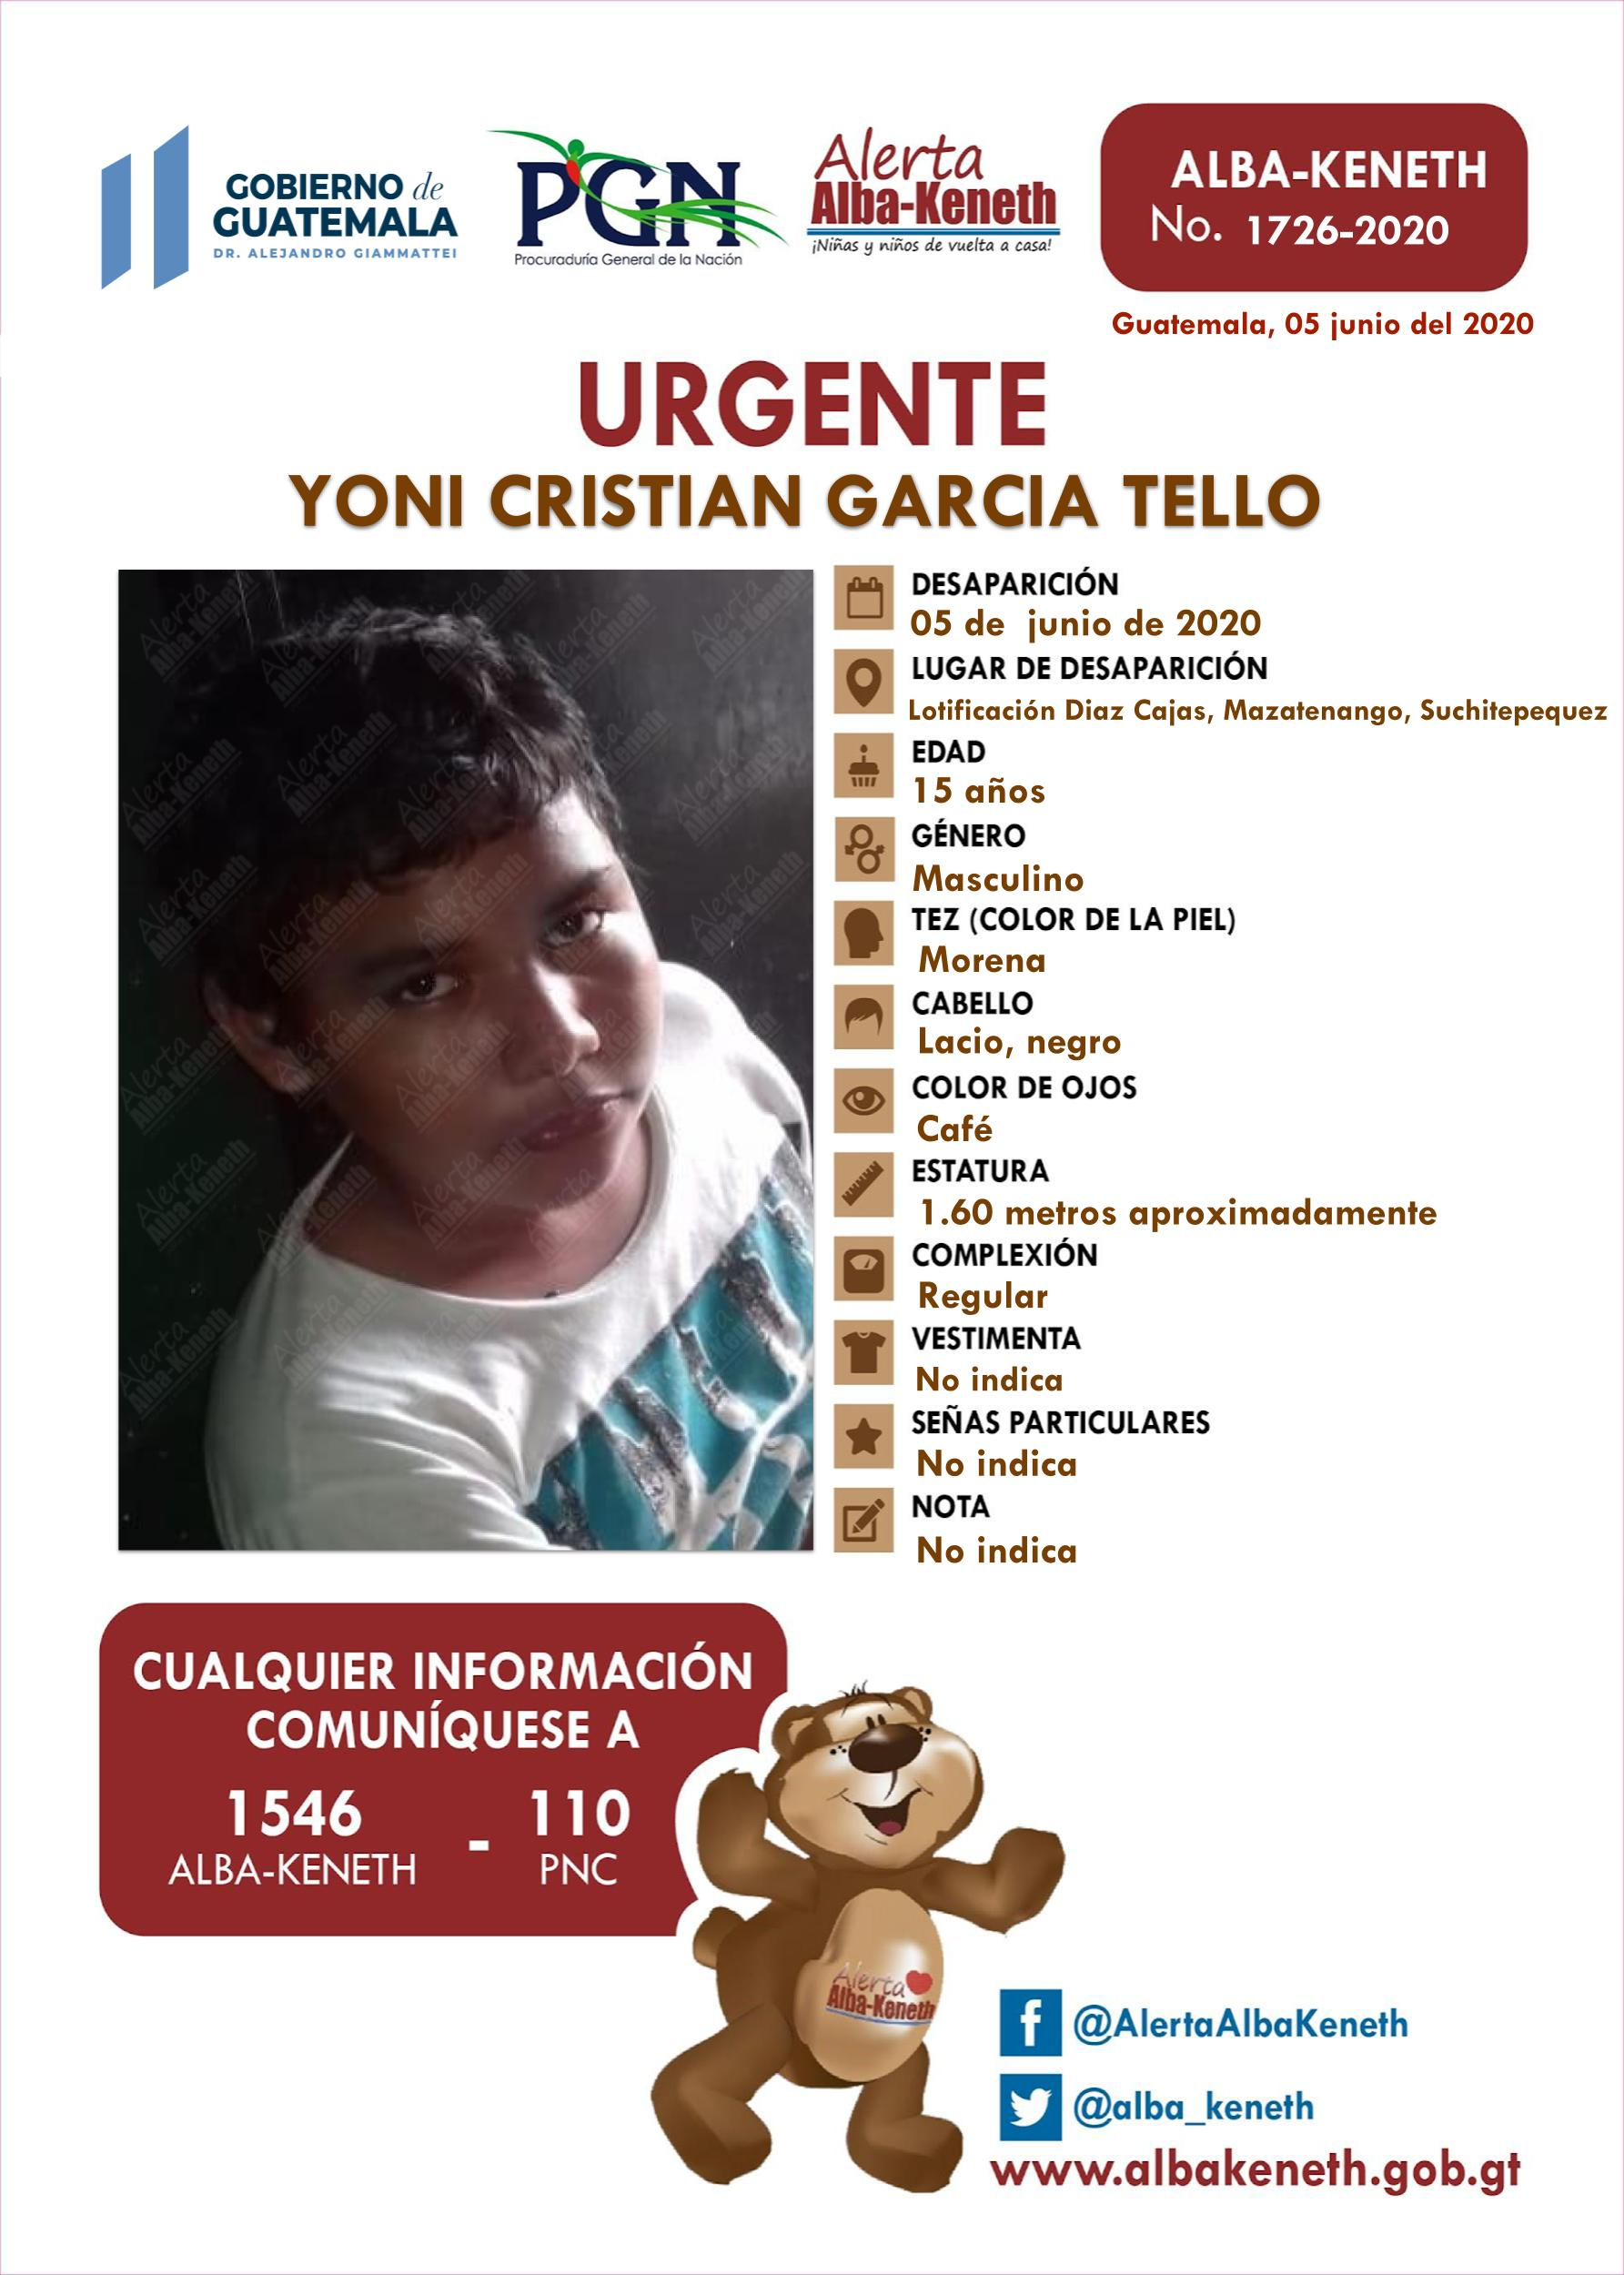 Yoni Cristian Garcia Tello